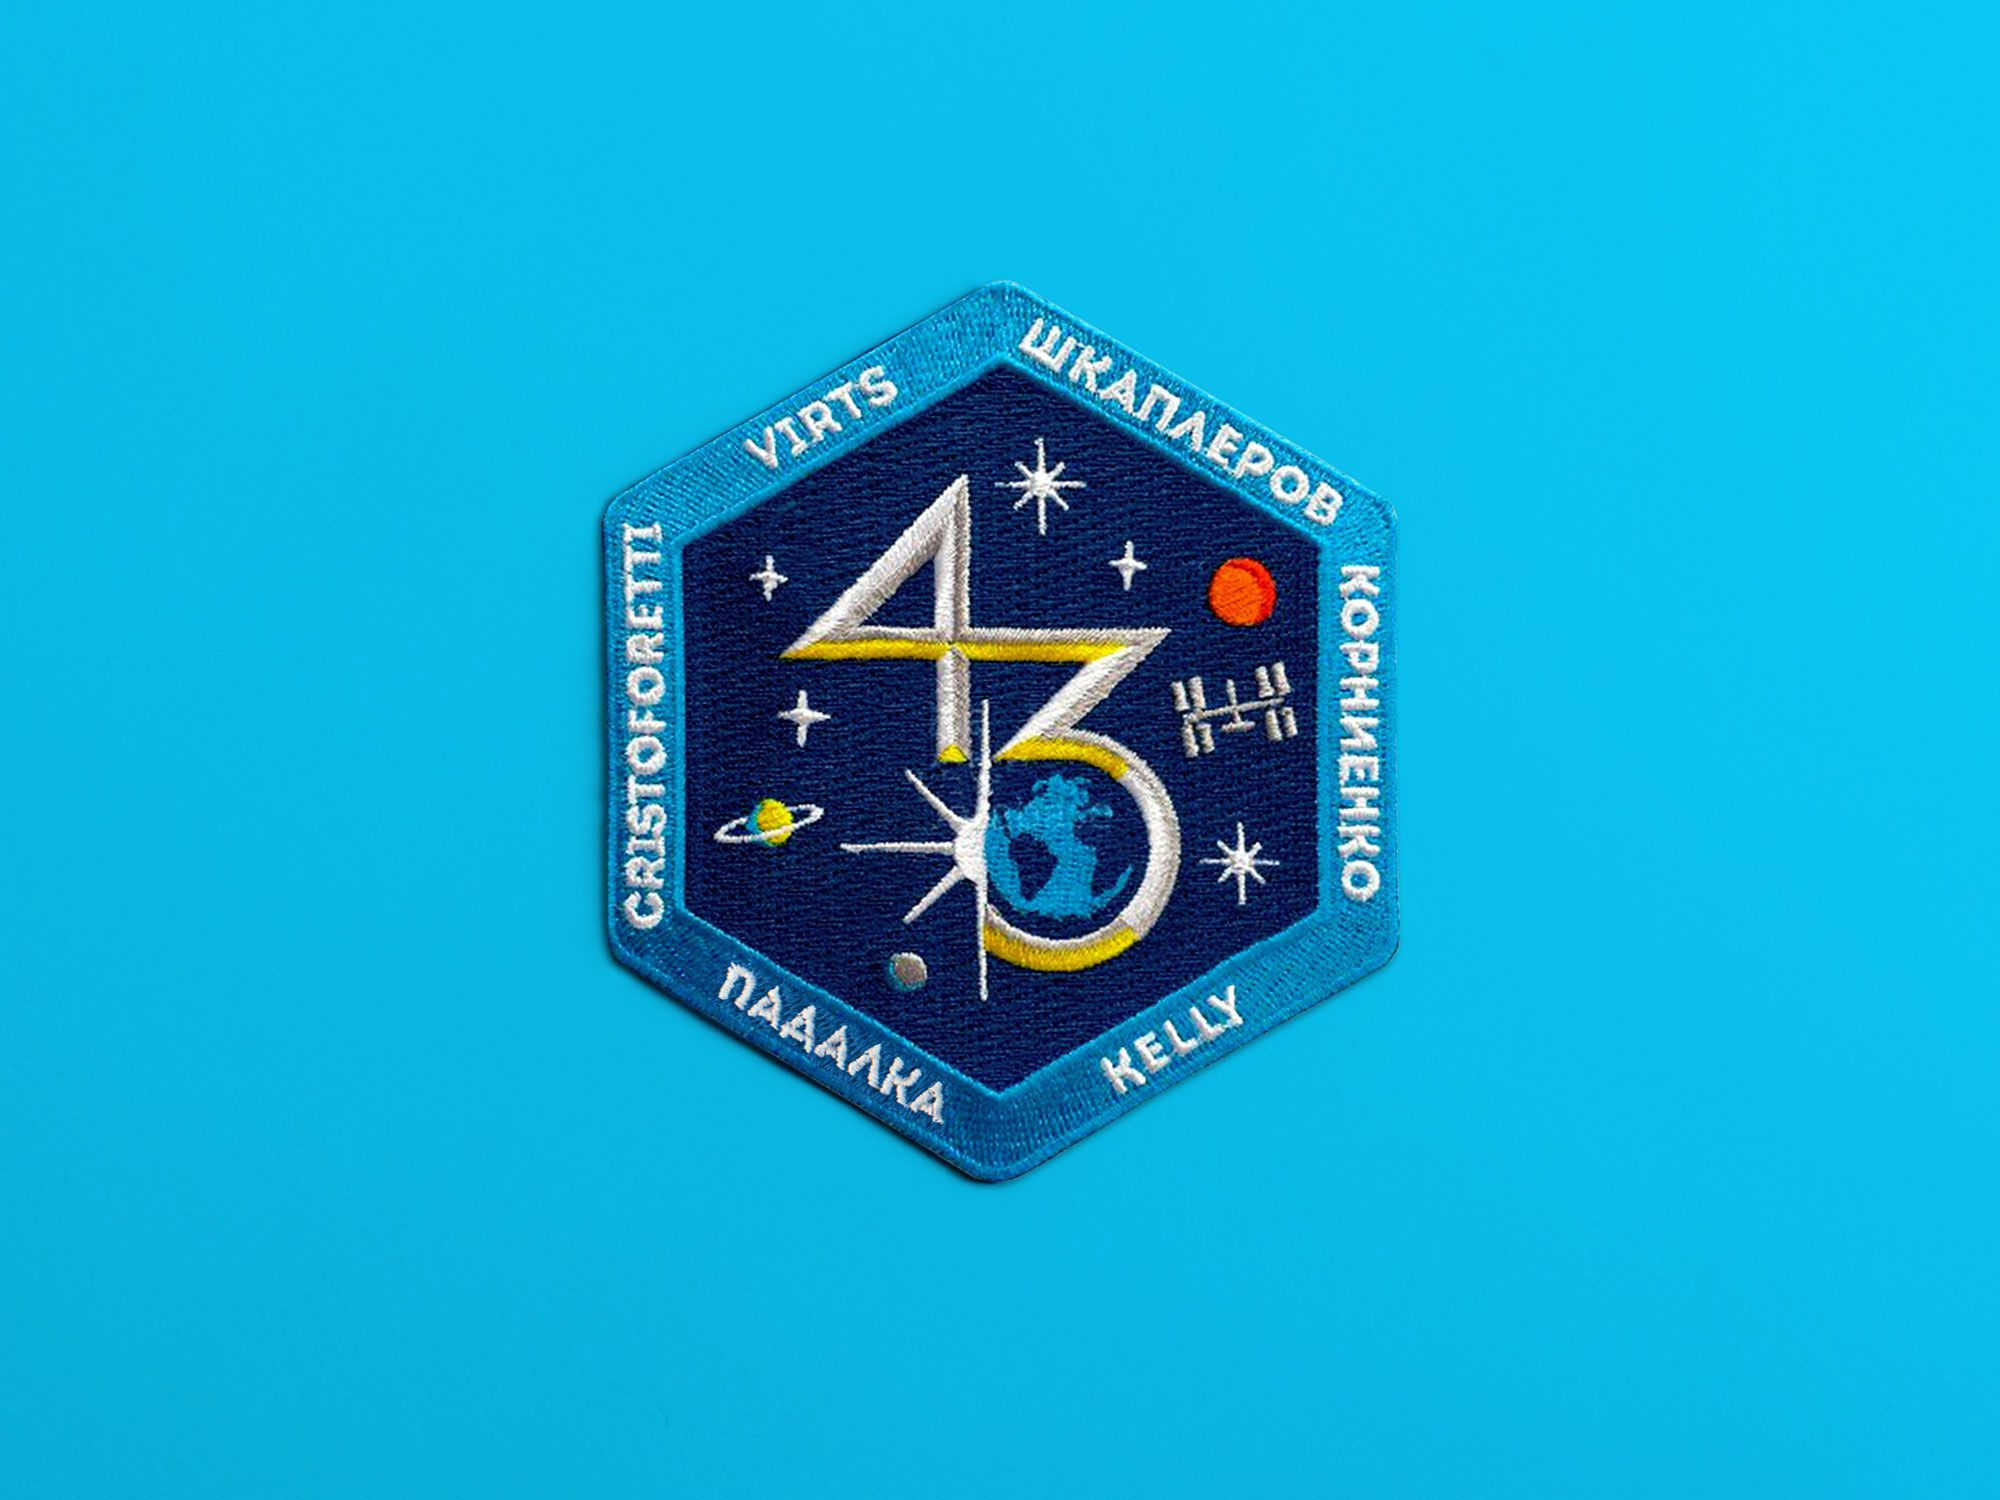 NASA ISS Expedition 43 Matt Lehman Studio Nasa iss